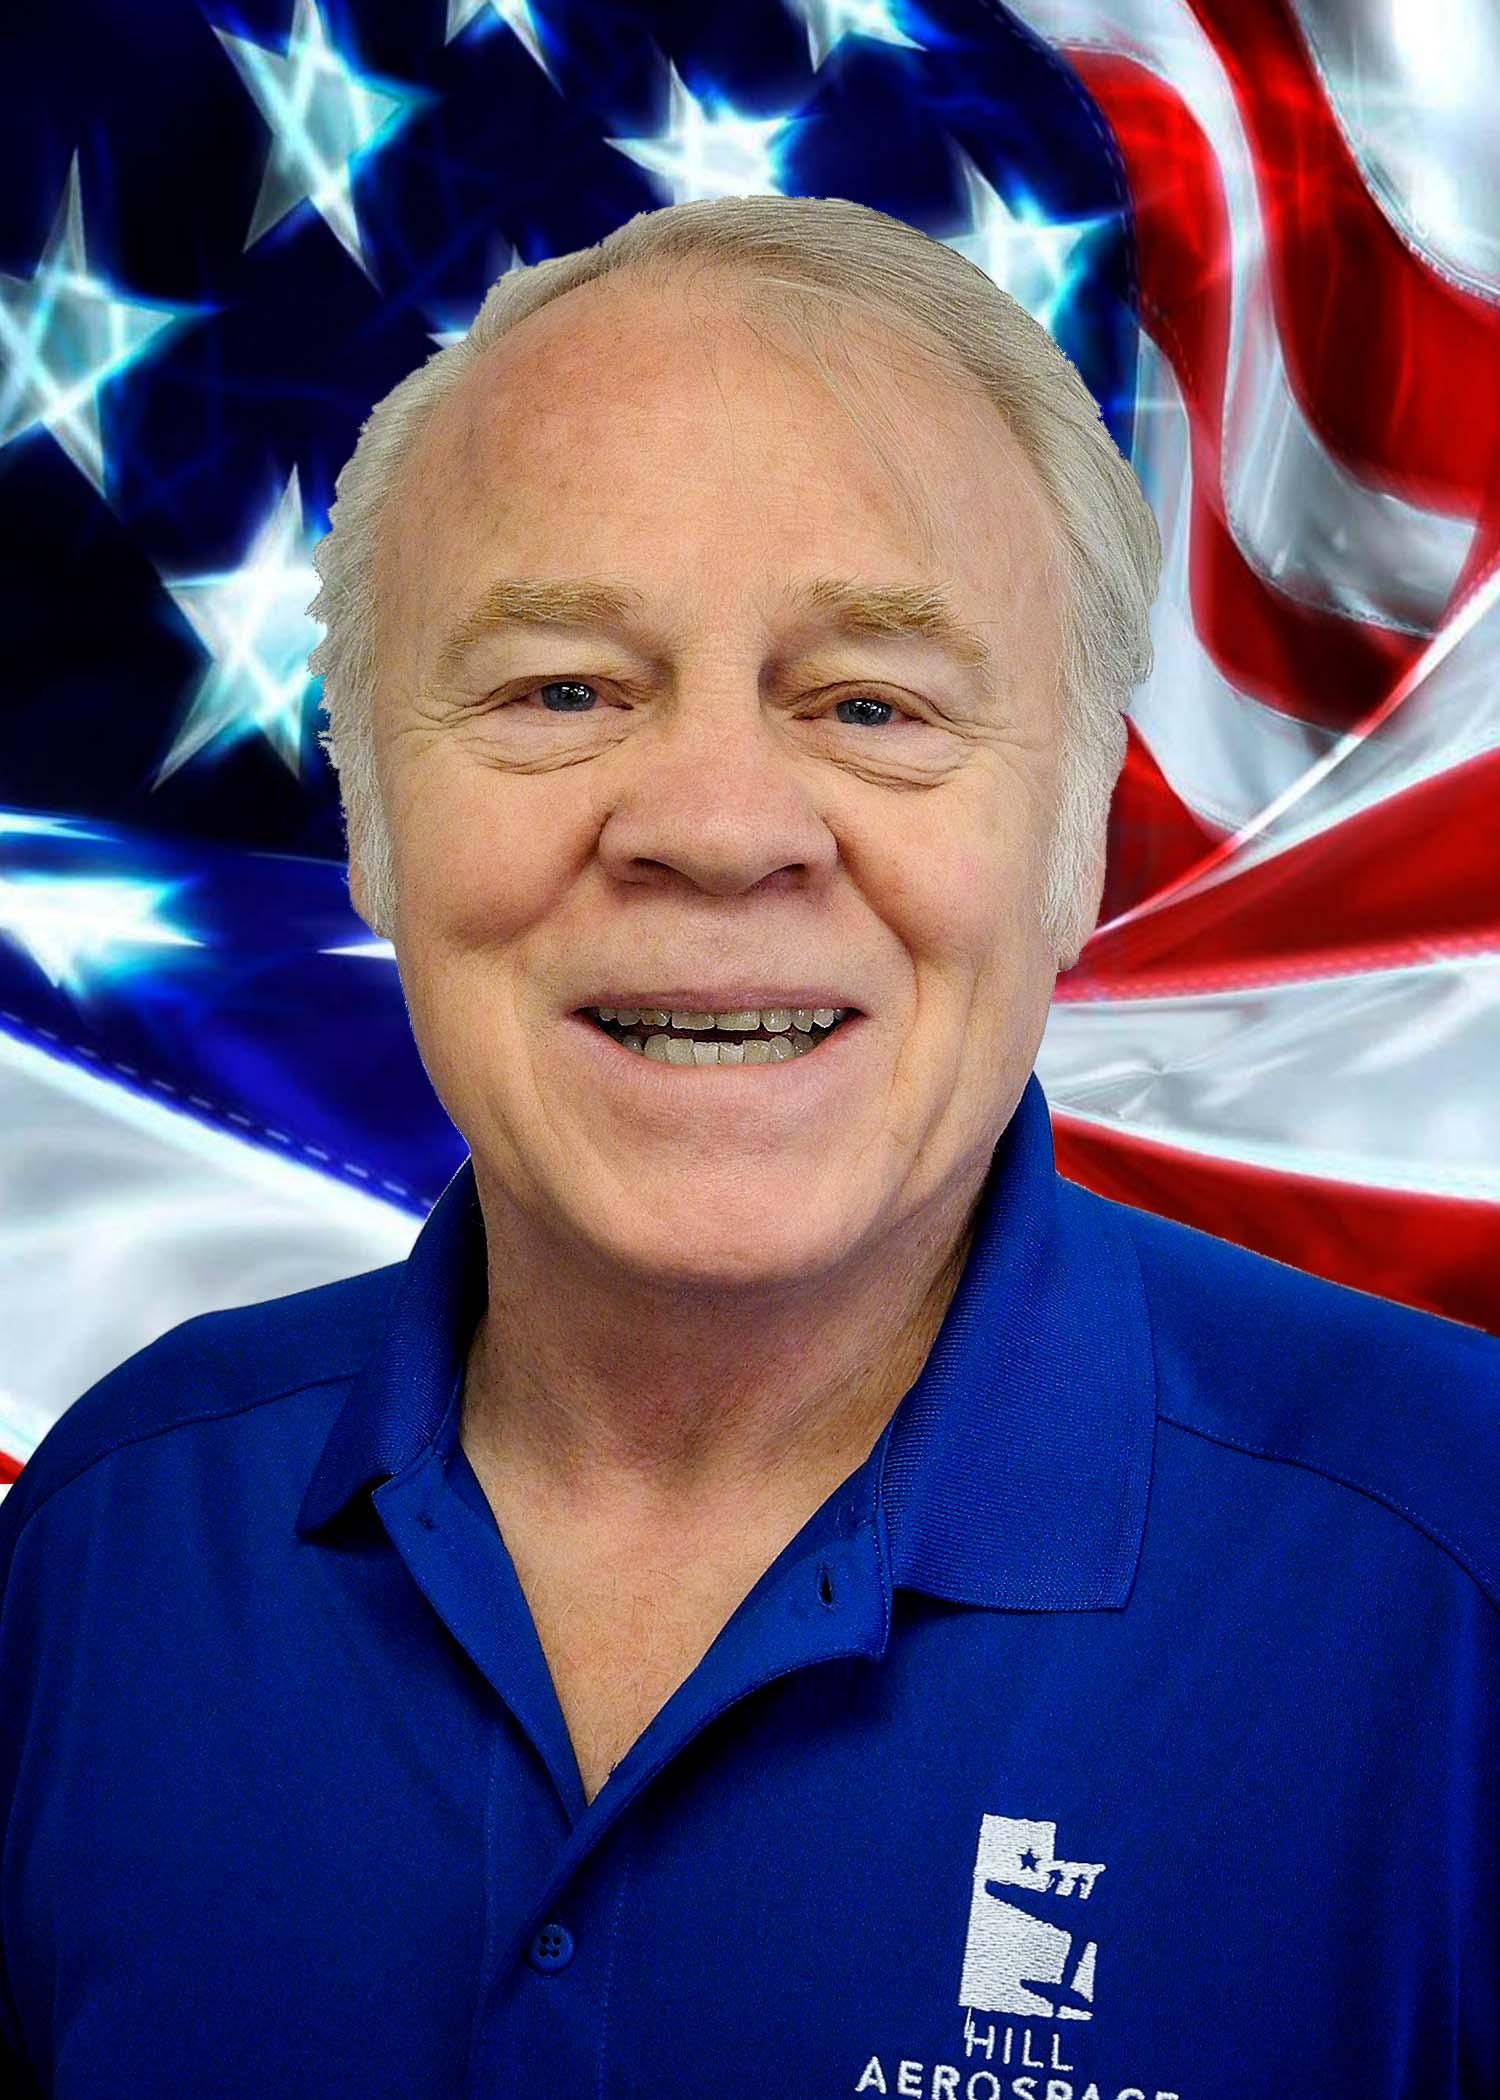 Hill Aerospace Foundation Volunteer, John Adrian with US Flag